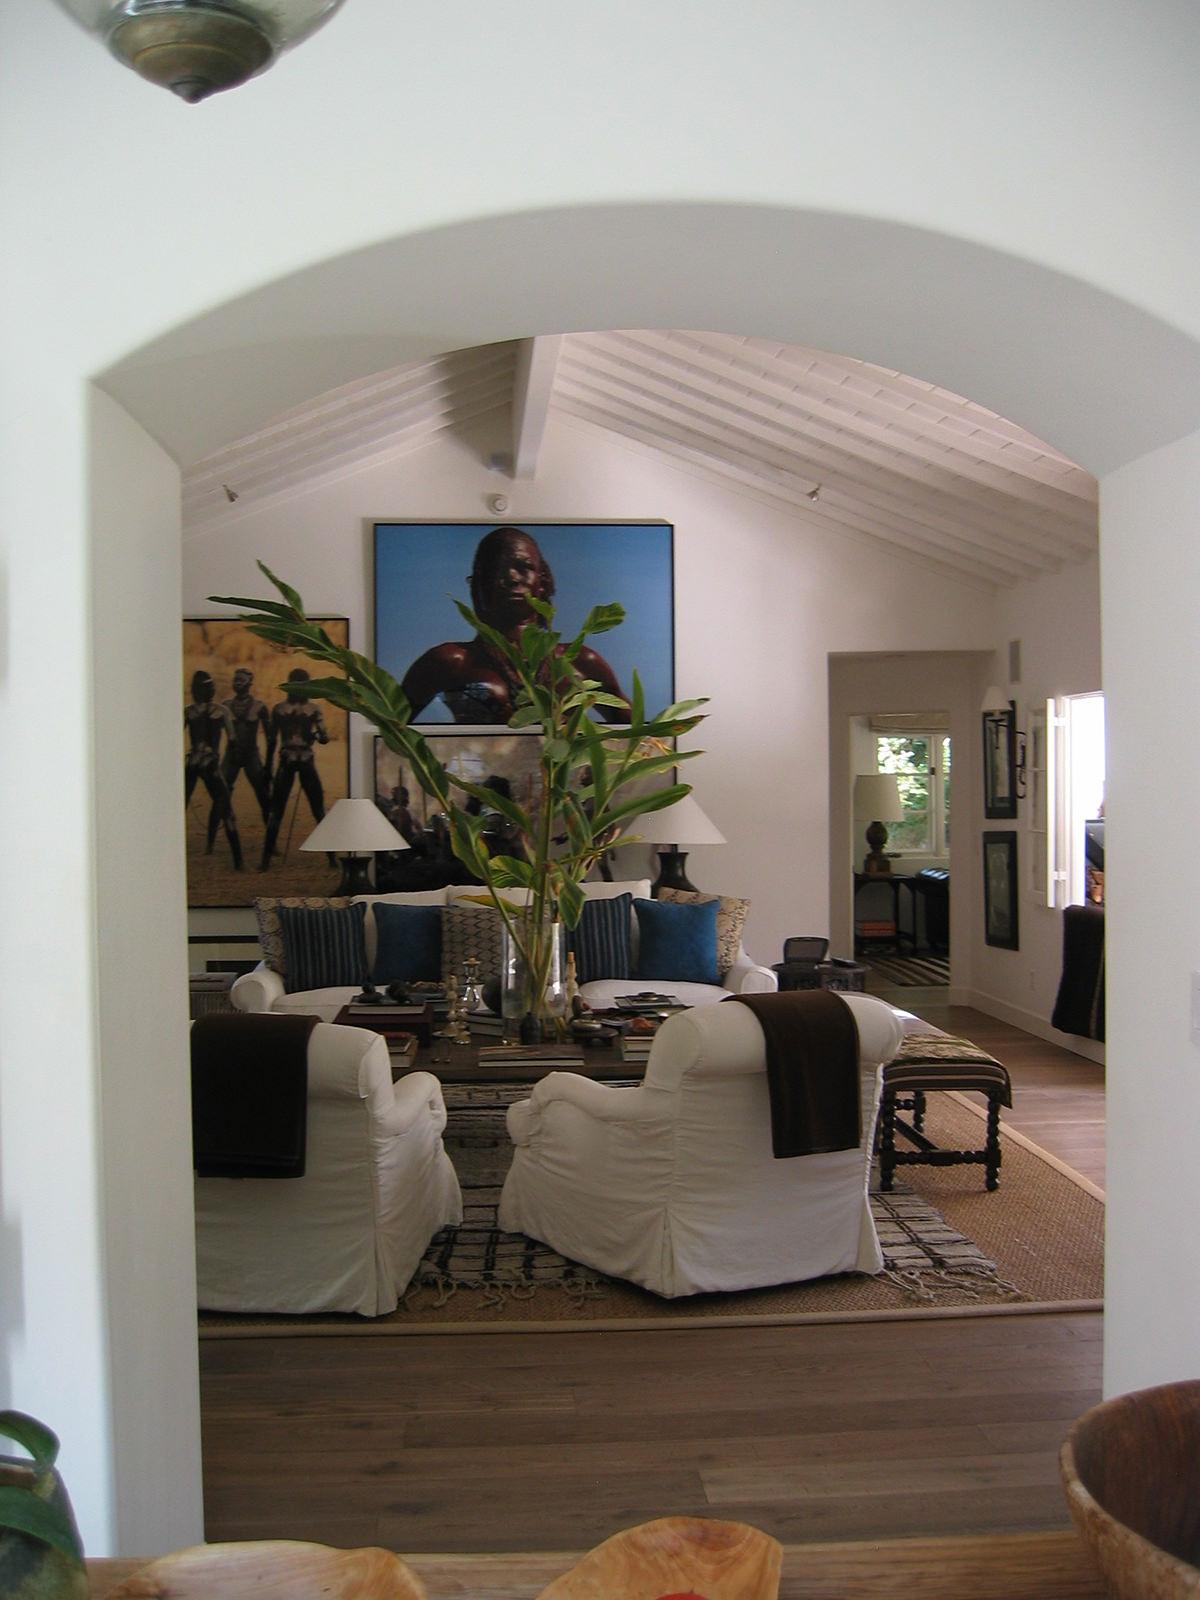 montecito-california-living-room-remodel-interior-design-montgomery-home.jpg